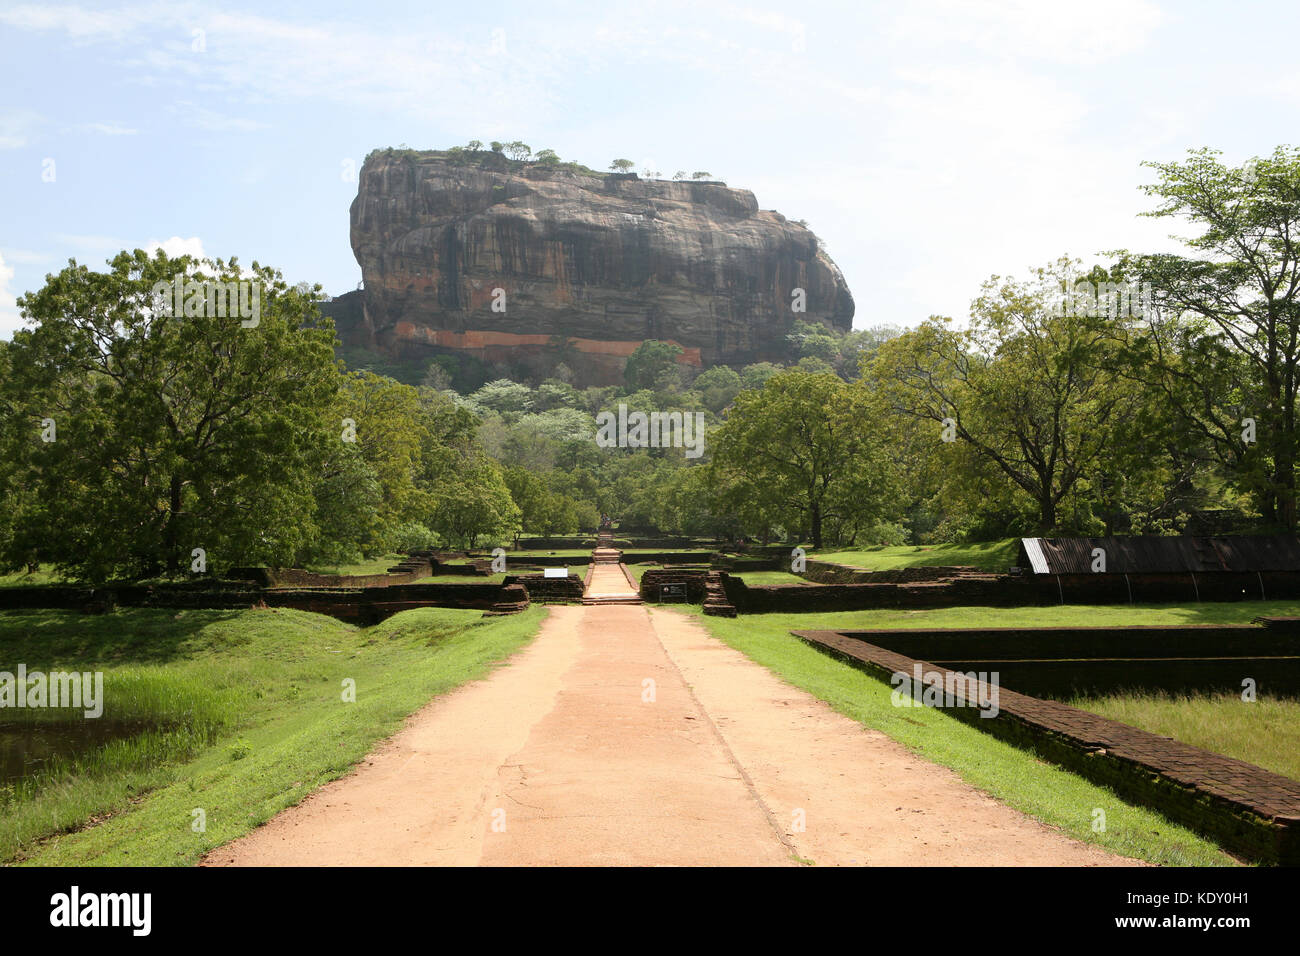 Sigiriya Lion Rock Festung in Sri Lanka mit Wandmalereien - Unesco World Heritage - Stock Image